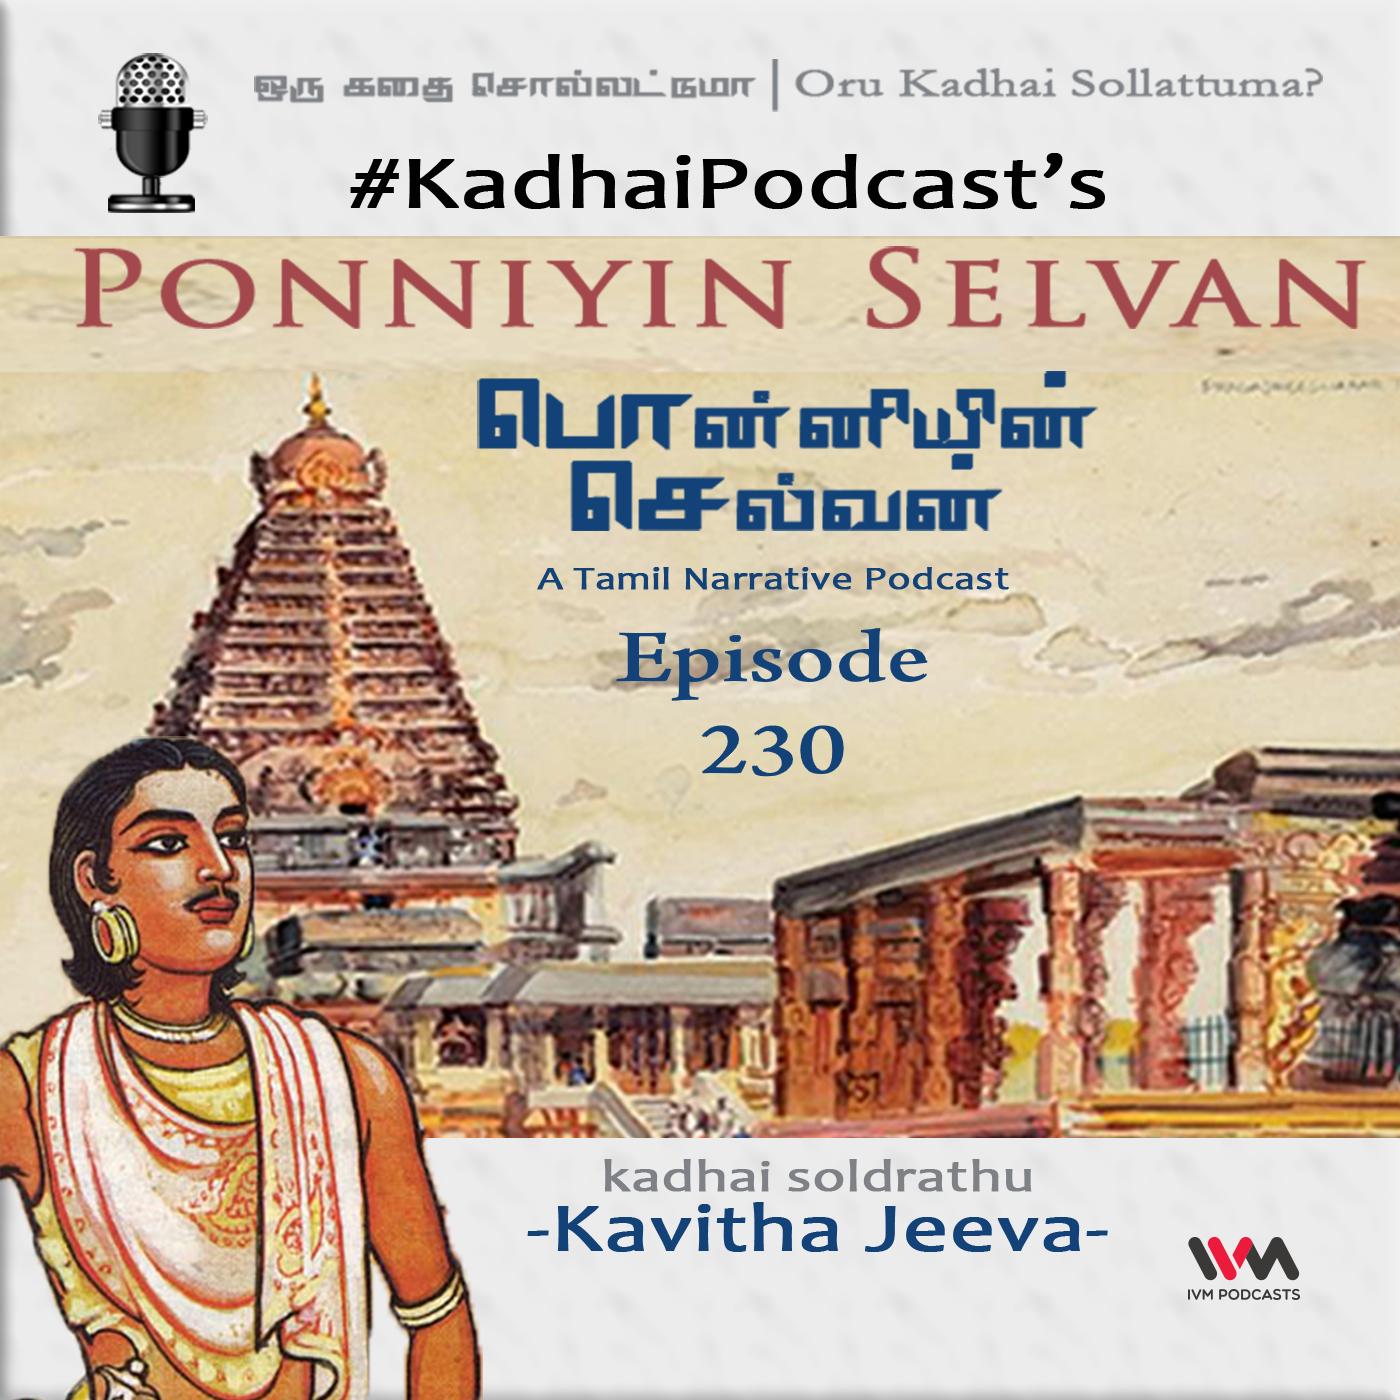 KadhaiPodcast's Ponniyin Selvan - Episode # 230